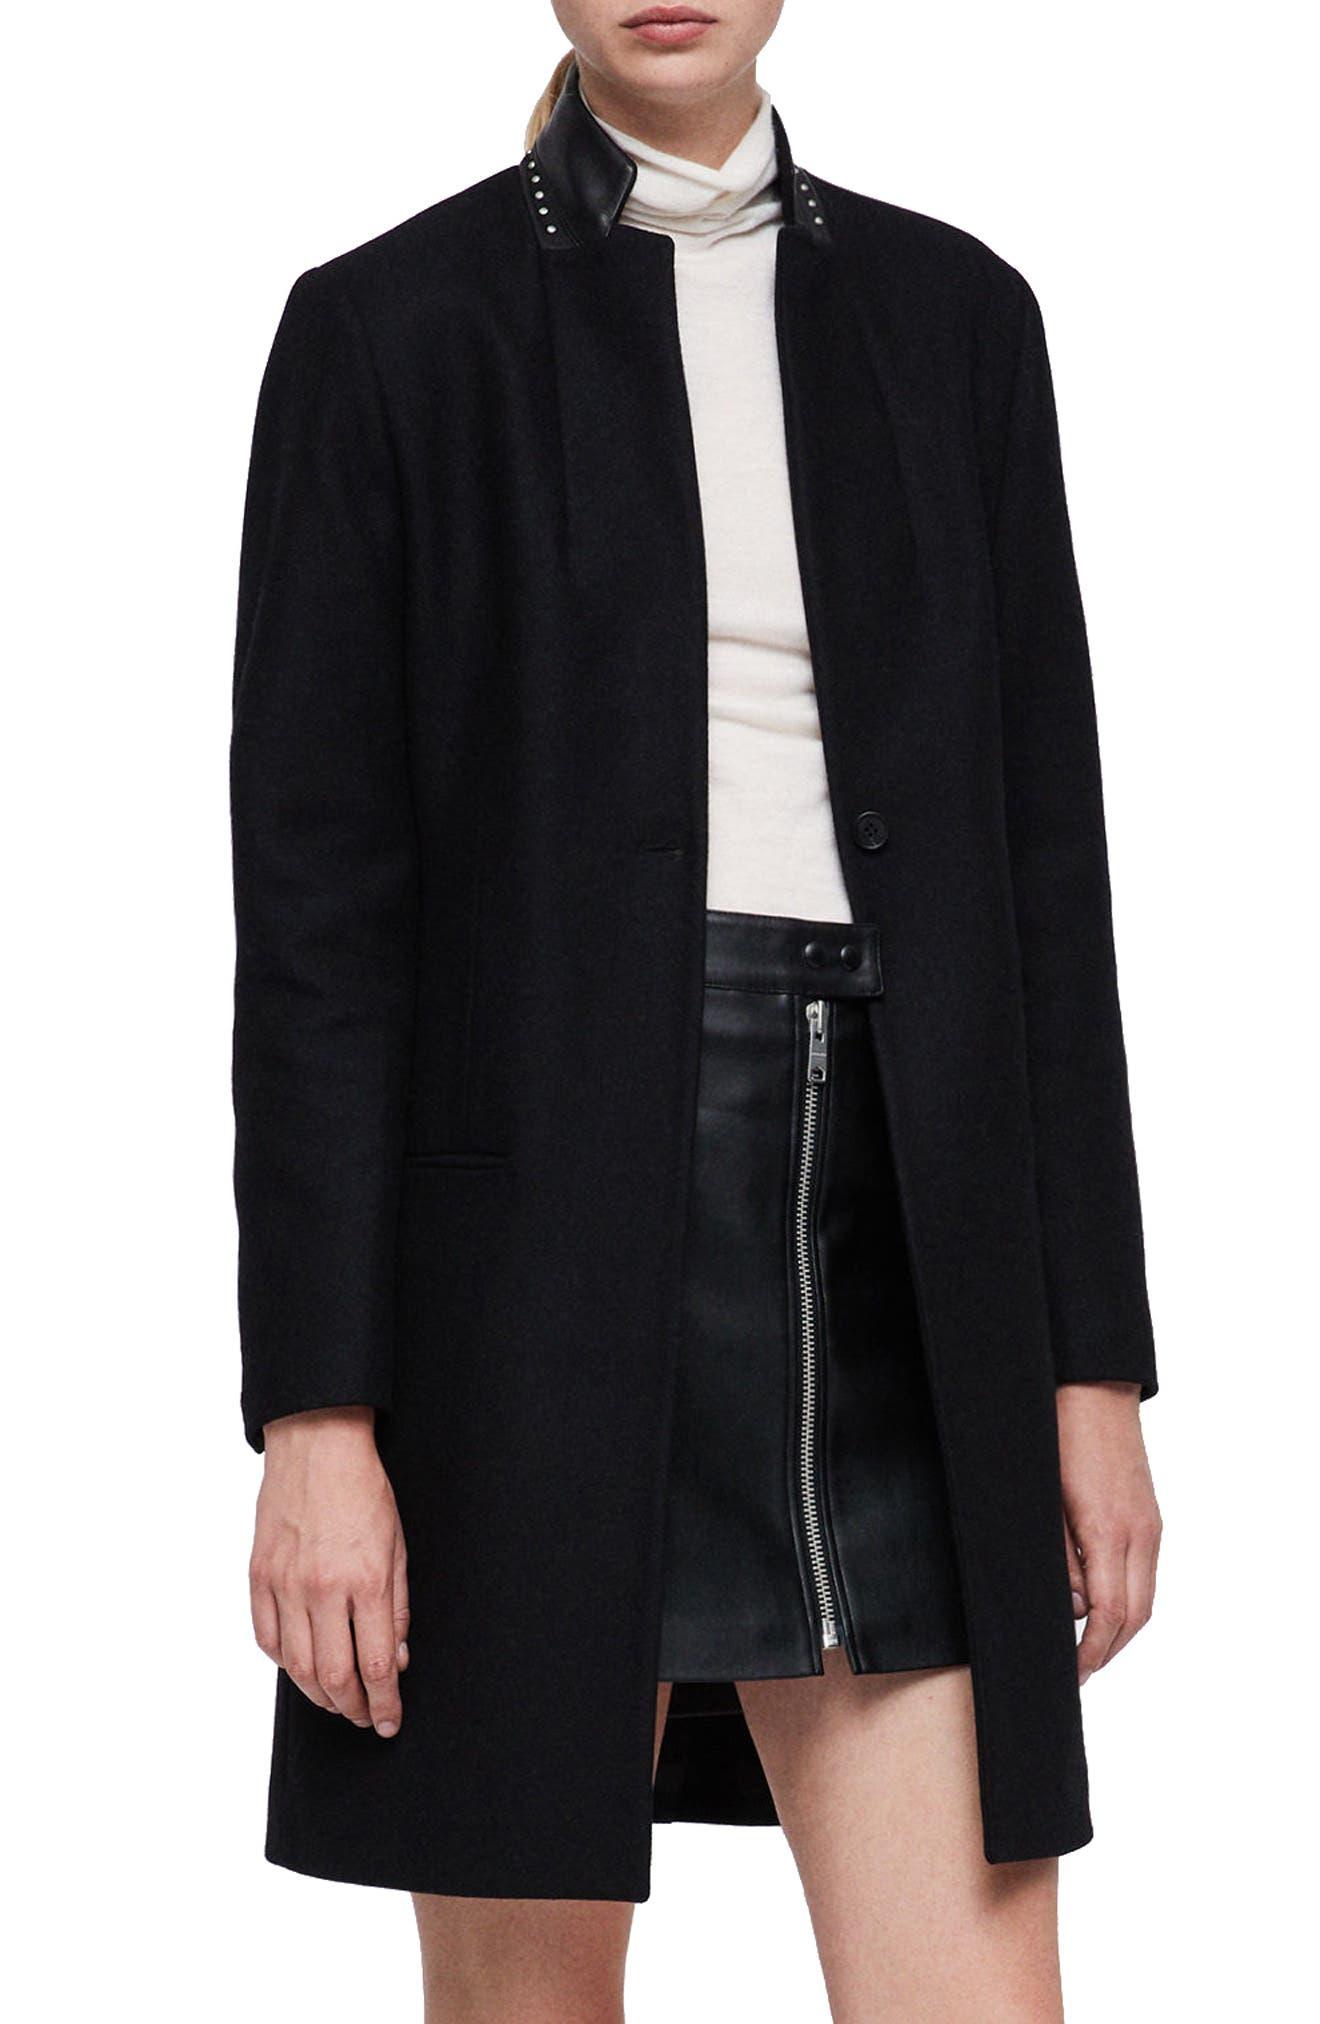 ALLSAINTS Leni Stud Trim Leather Collar Coat in Black